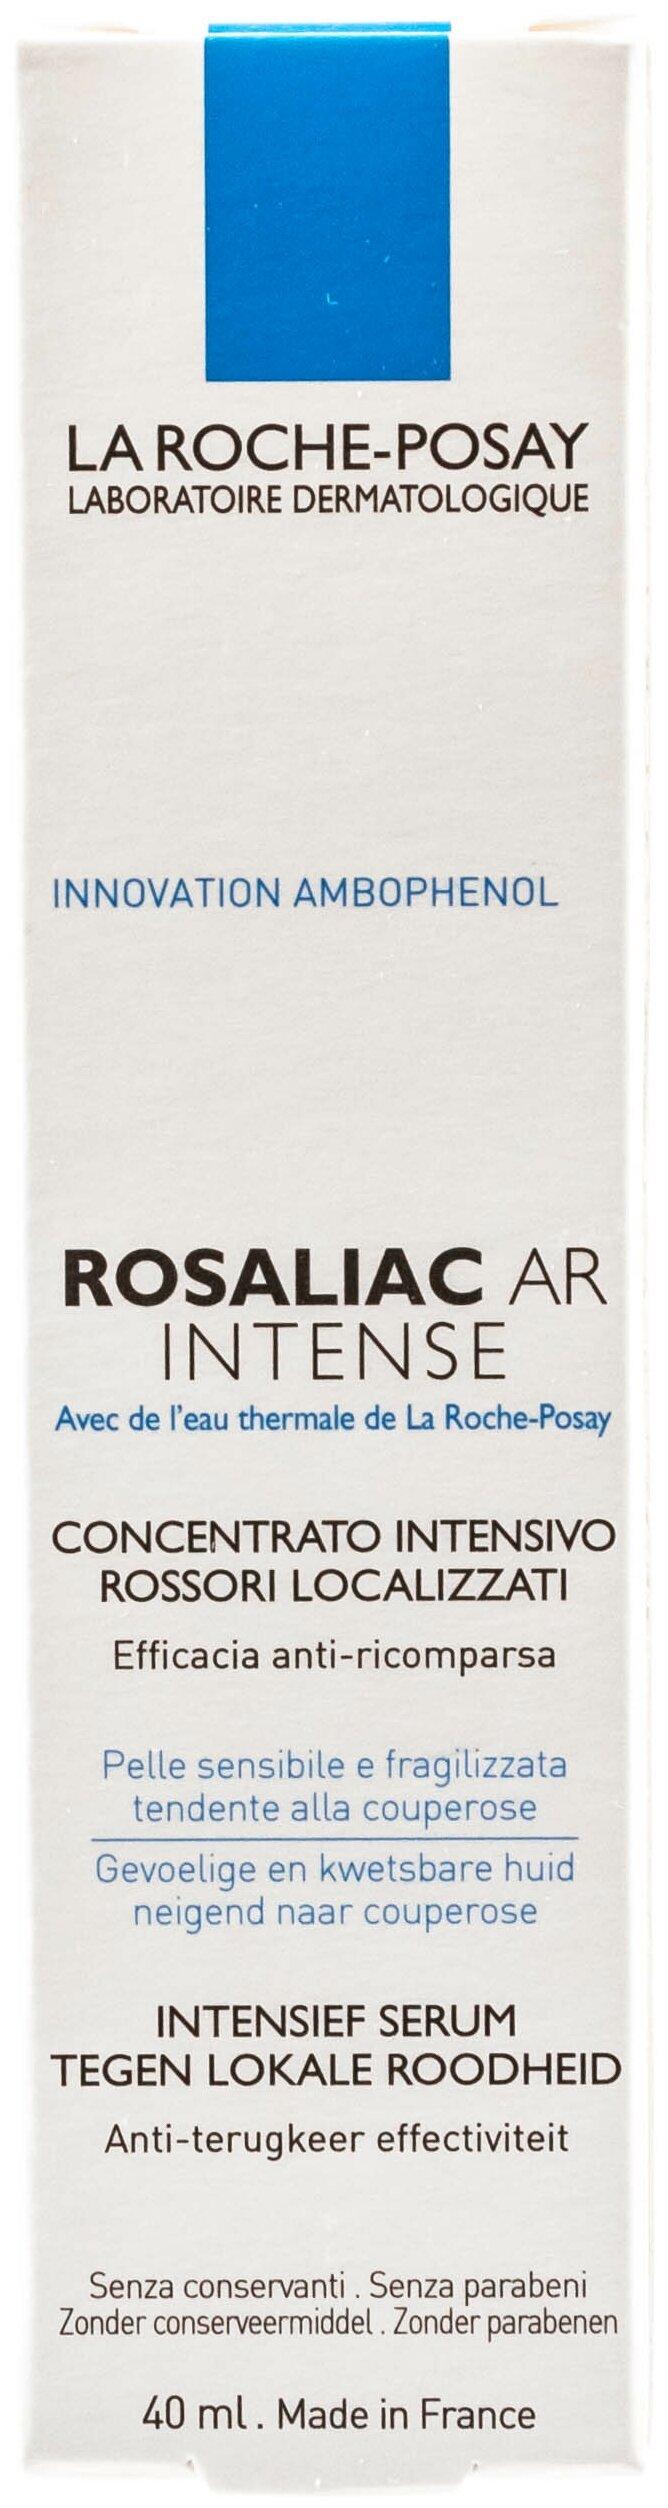 Rosacea ml ar intense la 40 posay roche rosaliac Rosaliac AR